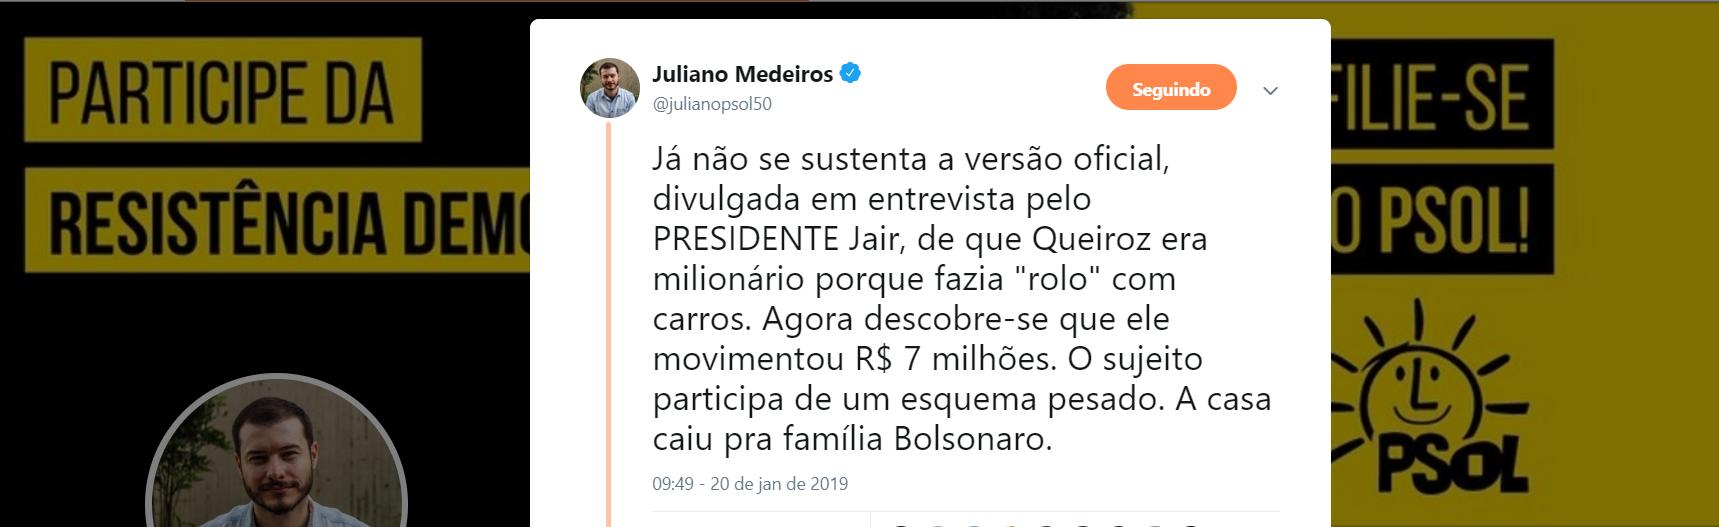 Juliano Medeiros: a casa caiu pra família Bolsonaro